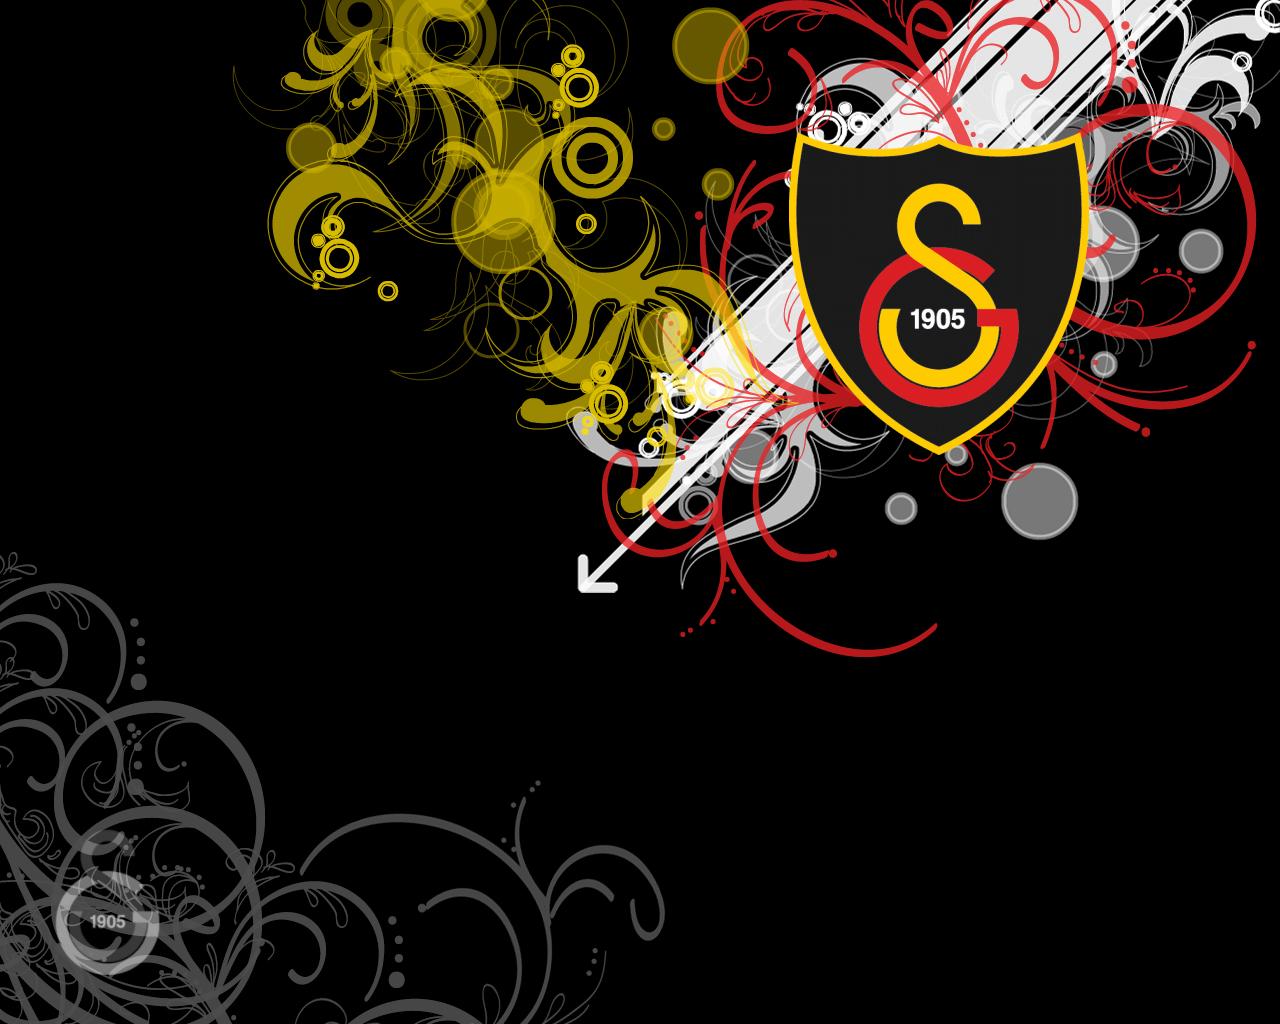 Gs Wallpaper Galatasaray Logo En G  Zel Gs Resimleri Galatasaray Duvar